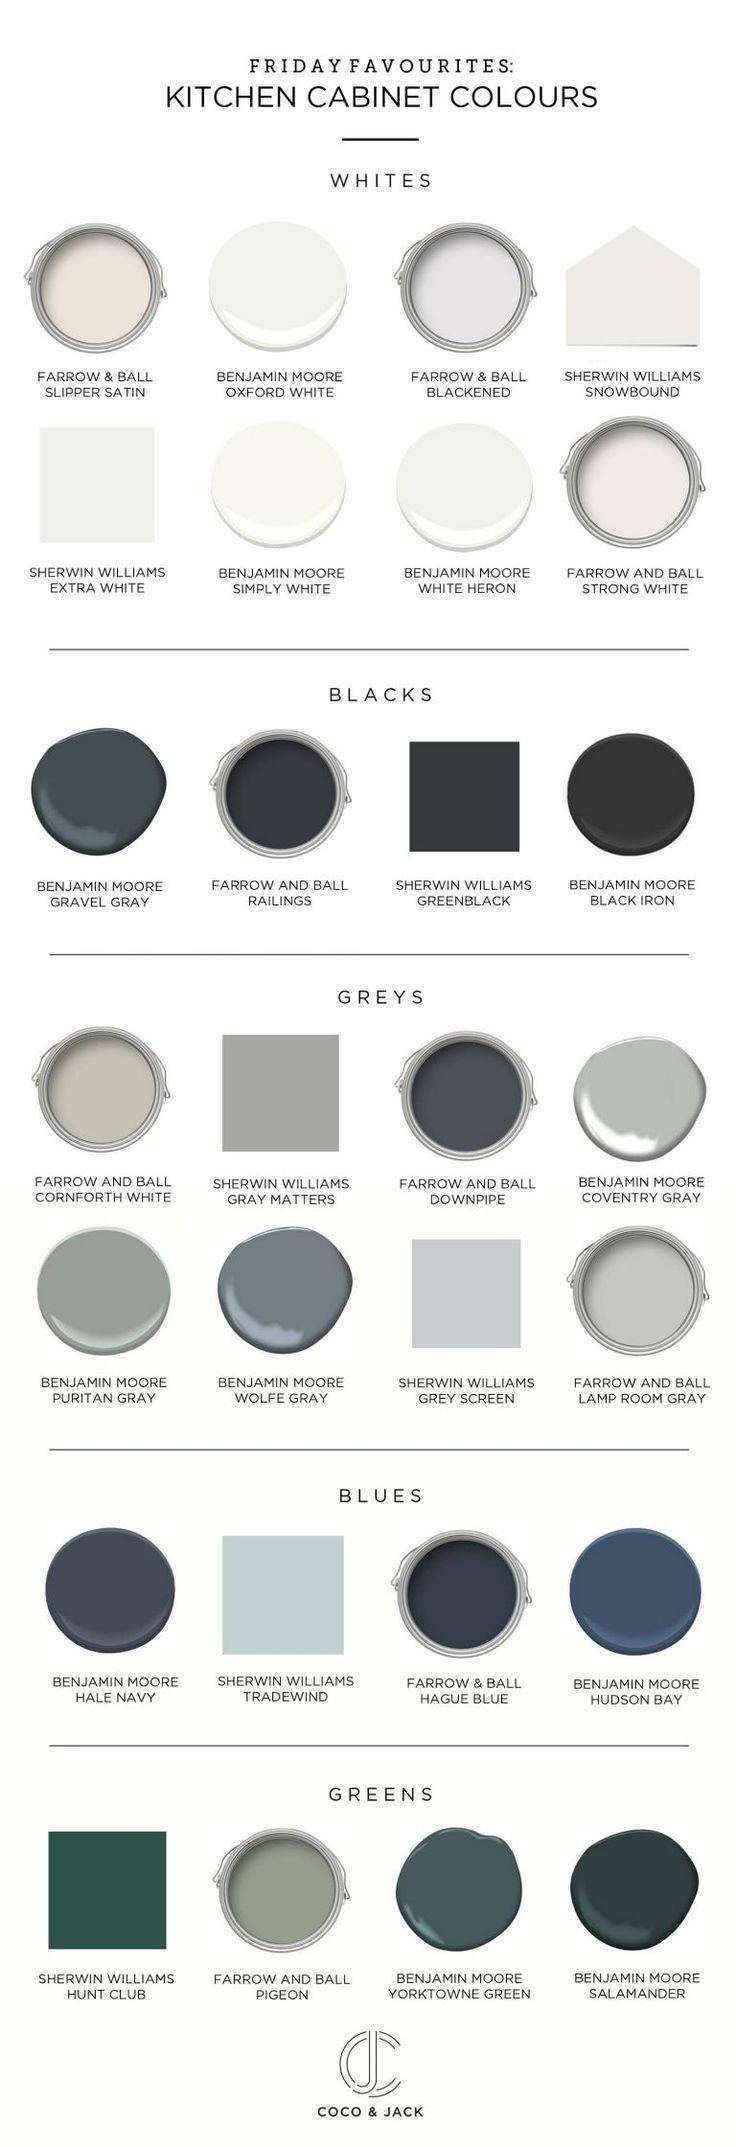 Gray kitchen cabinets ideas 23  Gray kitchen cabin #Cabinets #gray #Ideas #Kitchen #graykitchencabinets